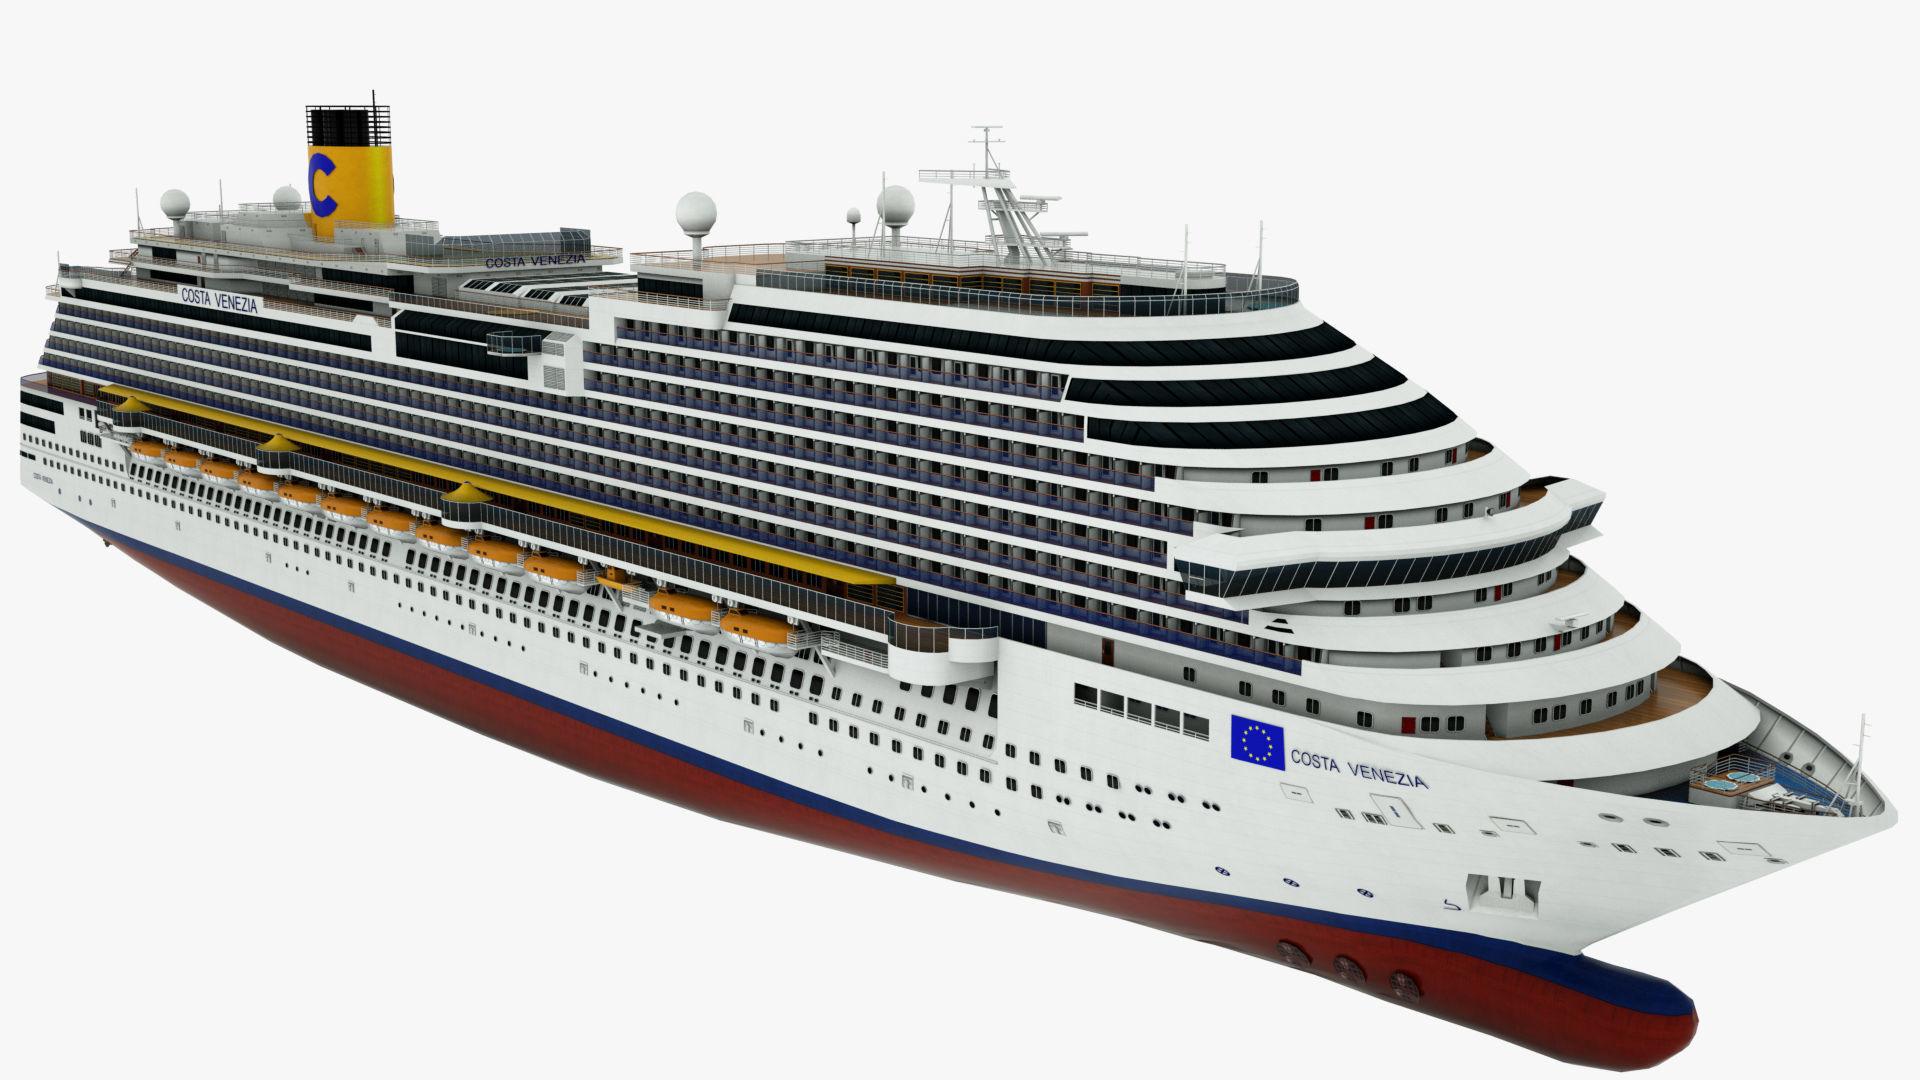 Cruise ship Costa Venezia